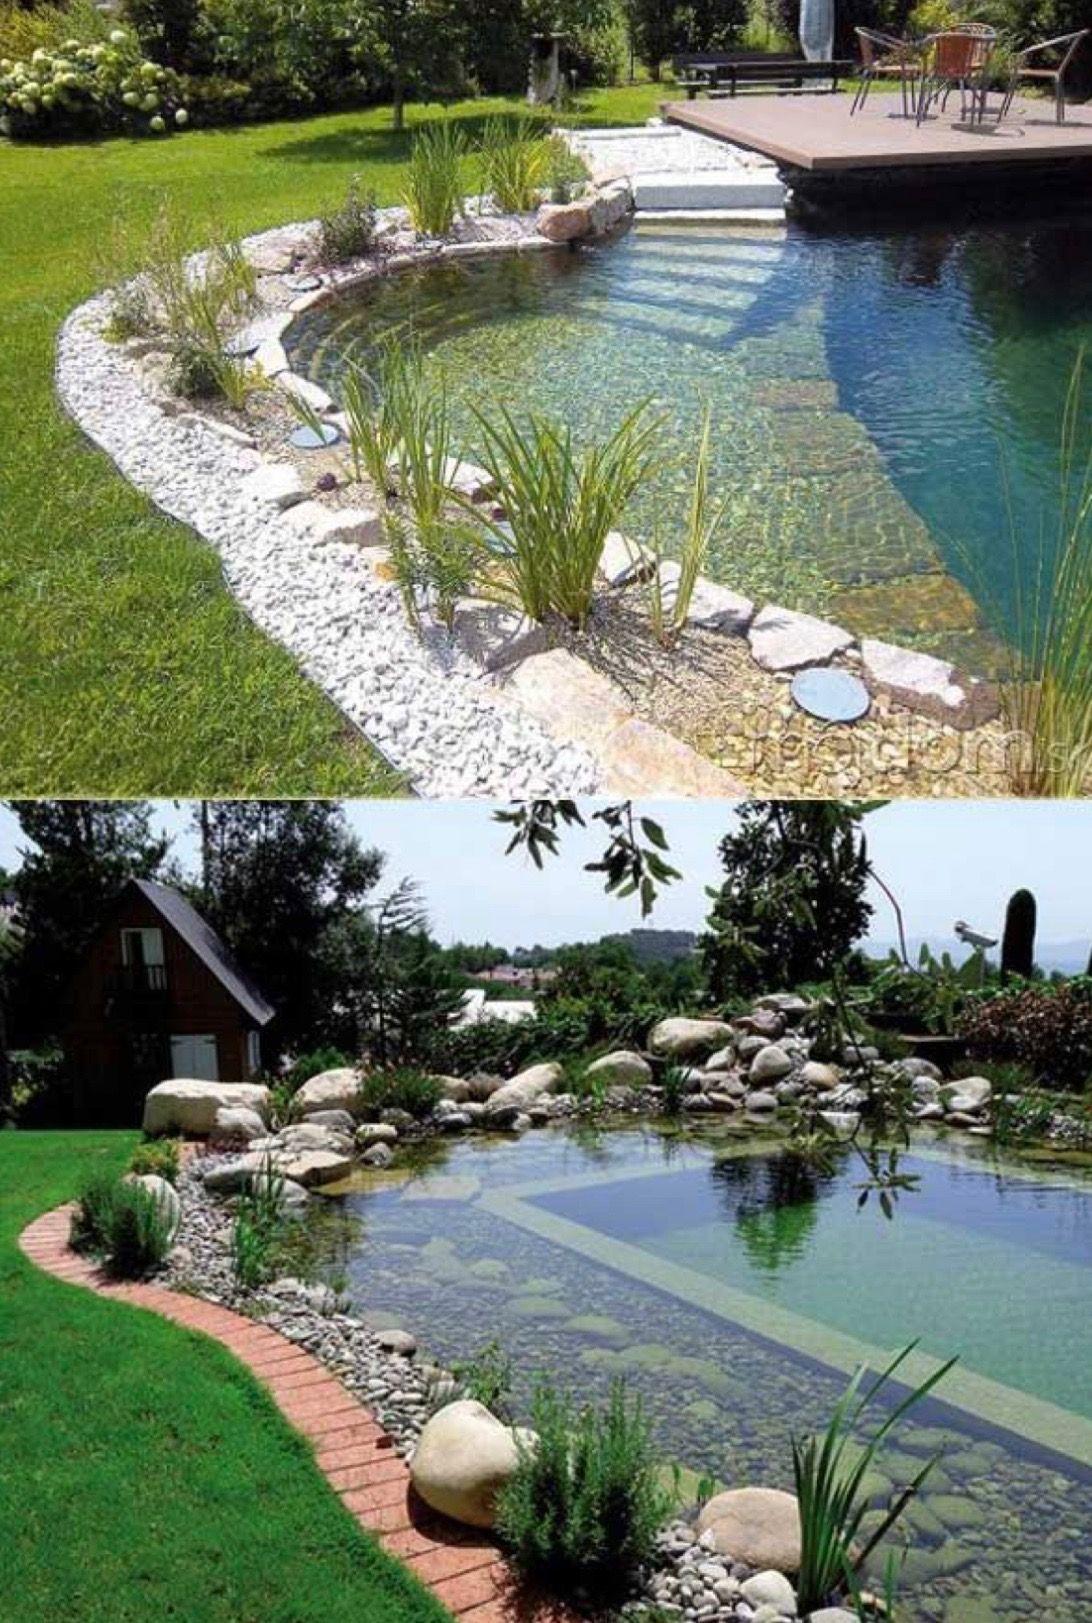 Pools Pooldesign Pools Wateringholes Swimming Backyard Pool Natural Pool Garden Pool